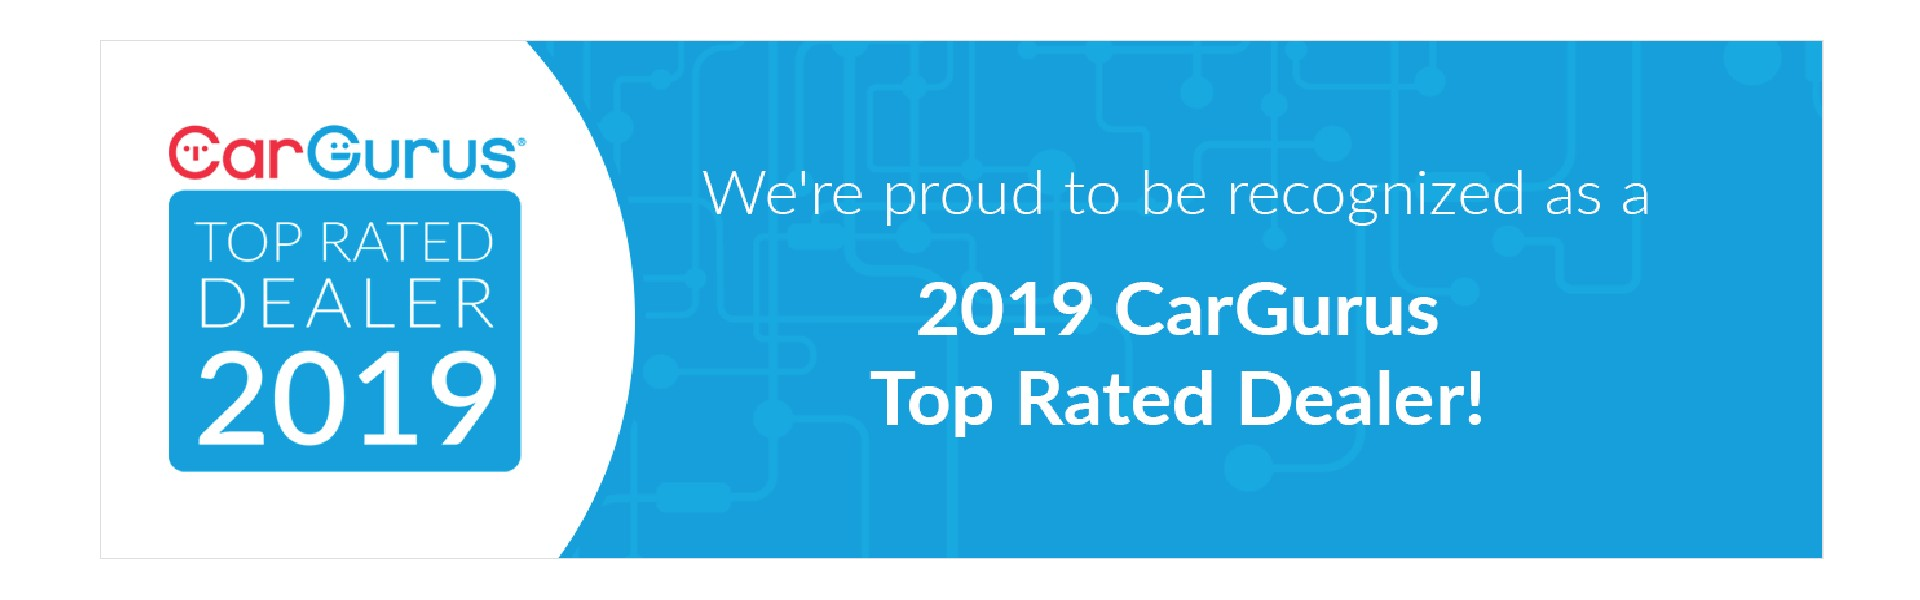 2019 CarGurus Top Rated Dealer